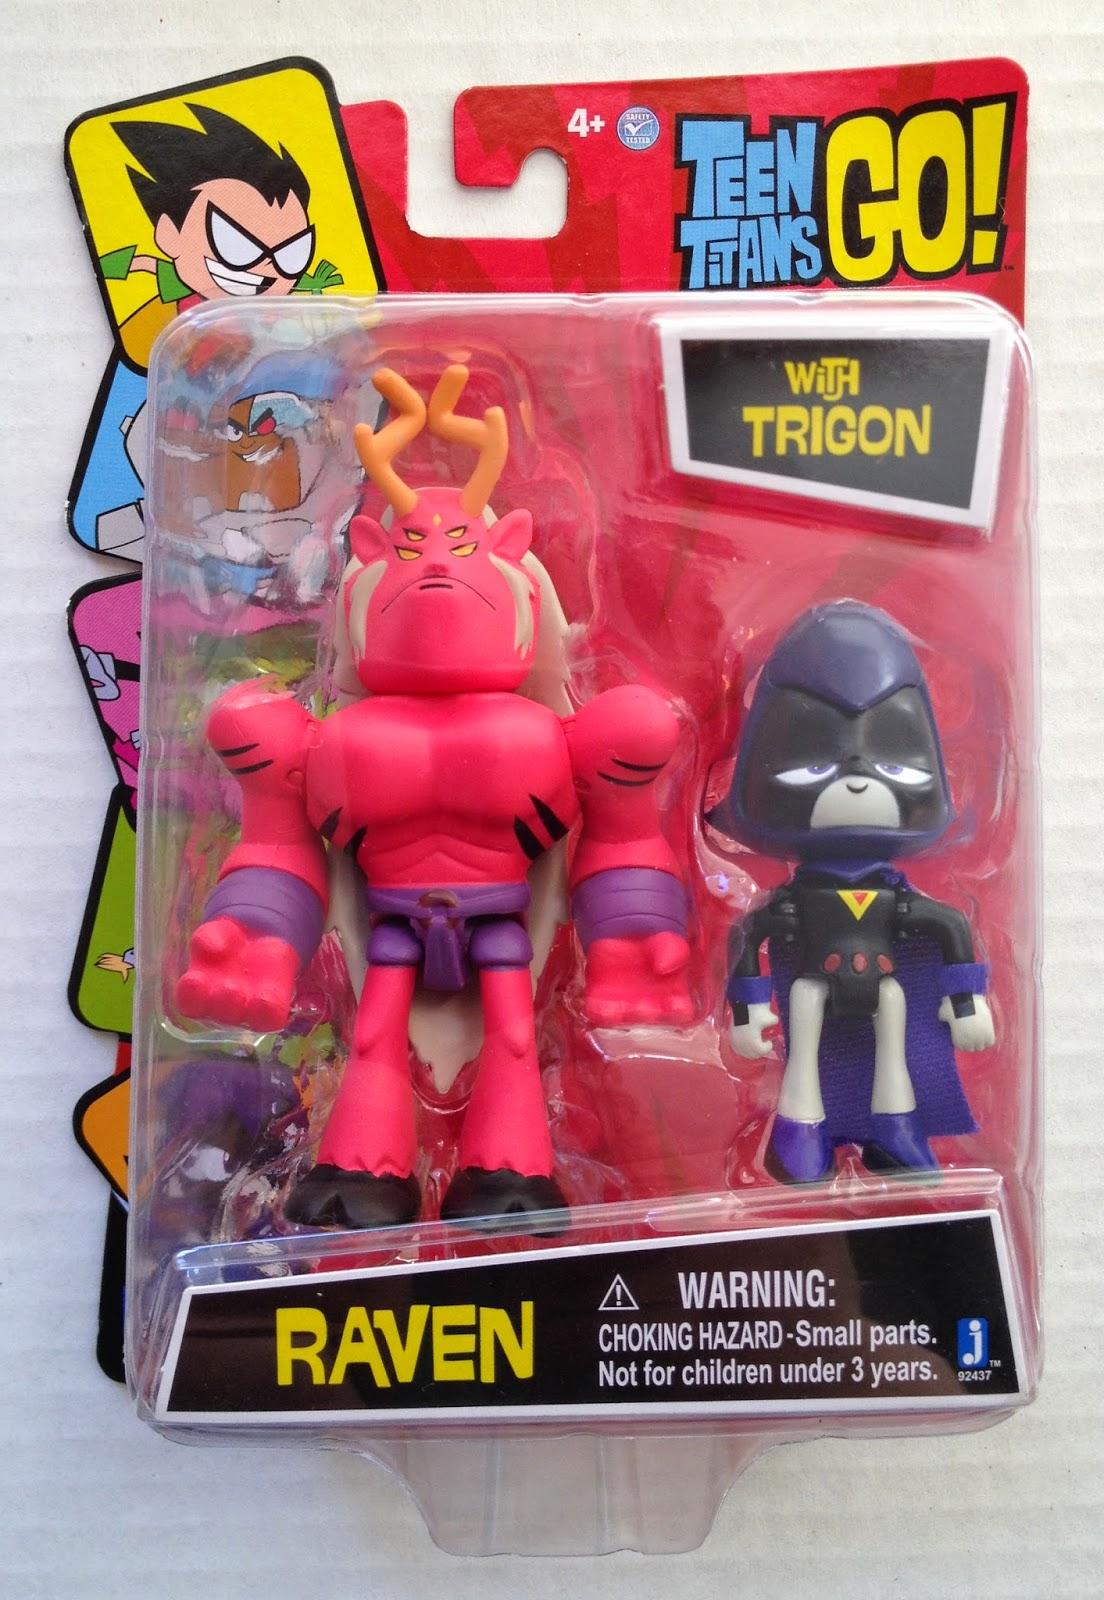 Action & Toy Figures Earnest Special Effects Revoltech 018 Alien Vs Predator Queen Non-scale Abs & Pvc Poseable Action Figure Toys For Children Original Box